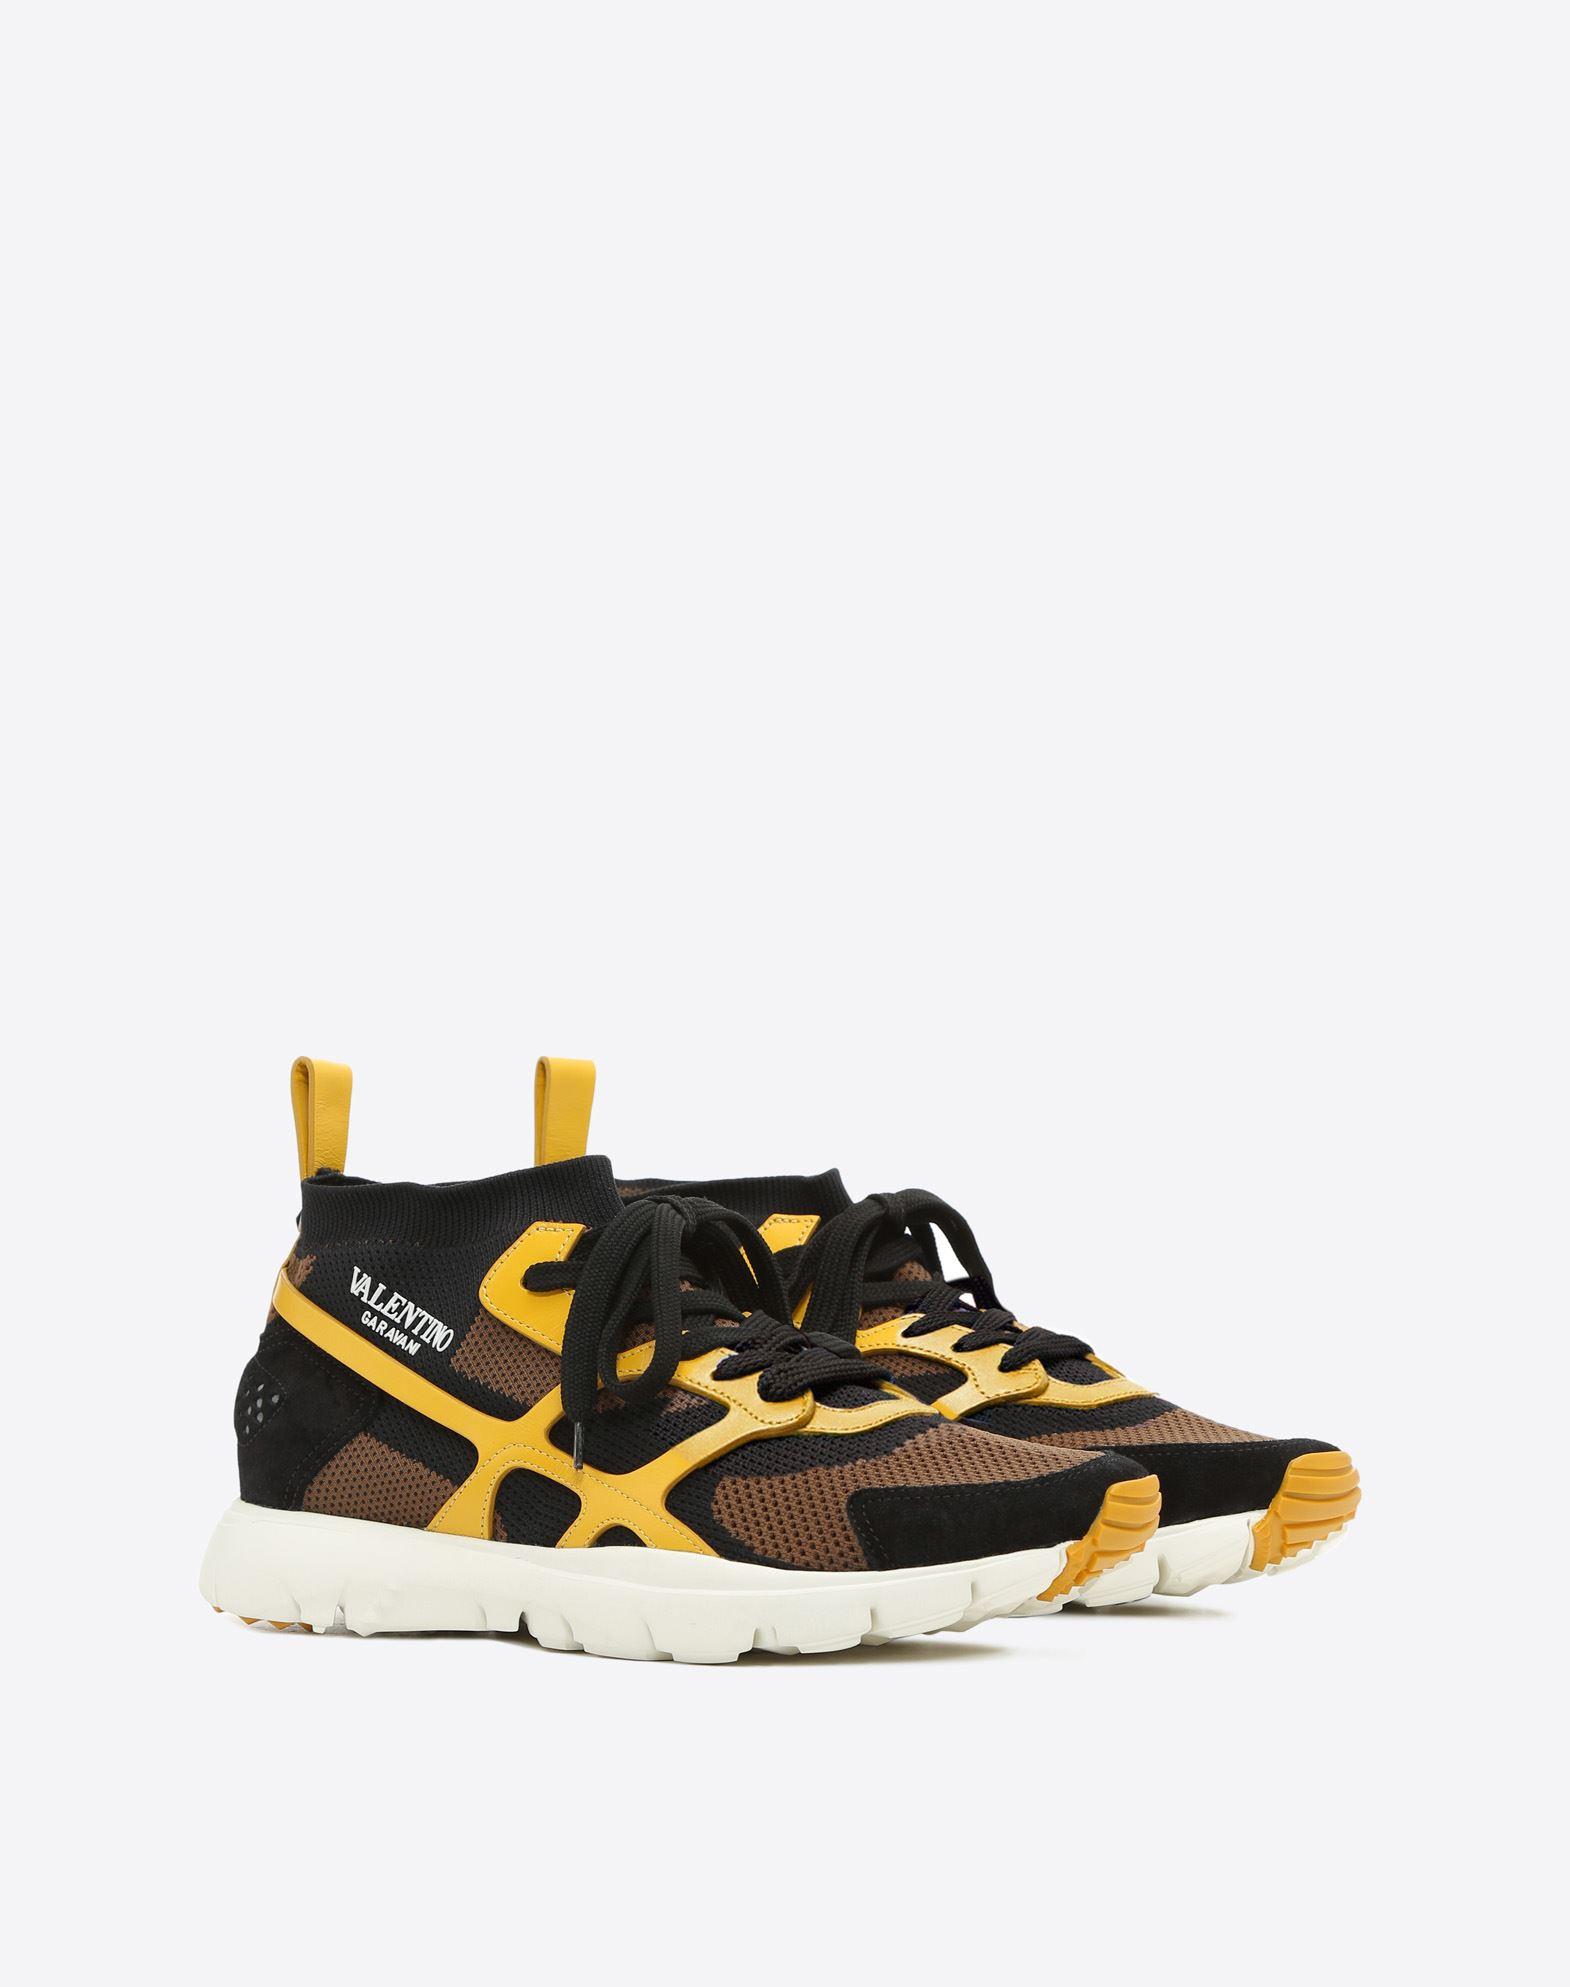 VALENTINO GARAVANI UOMO Sneakers Sound High SNEAKERS ALTAS U r